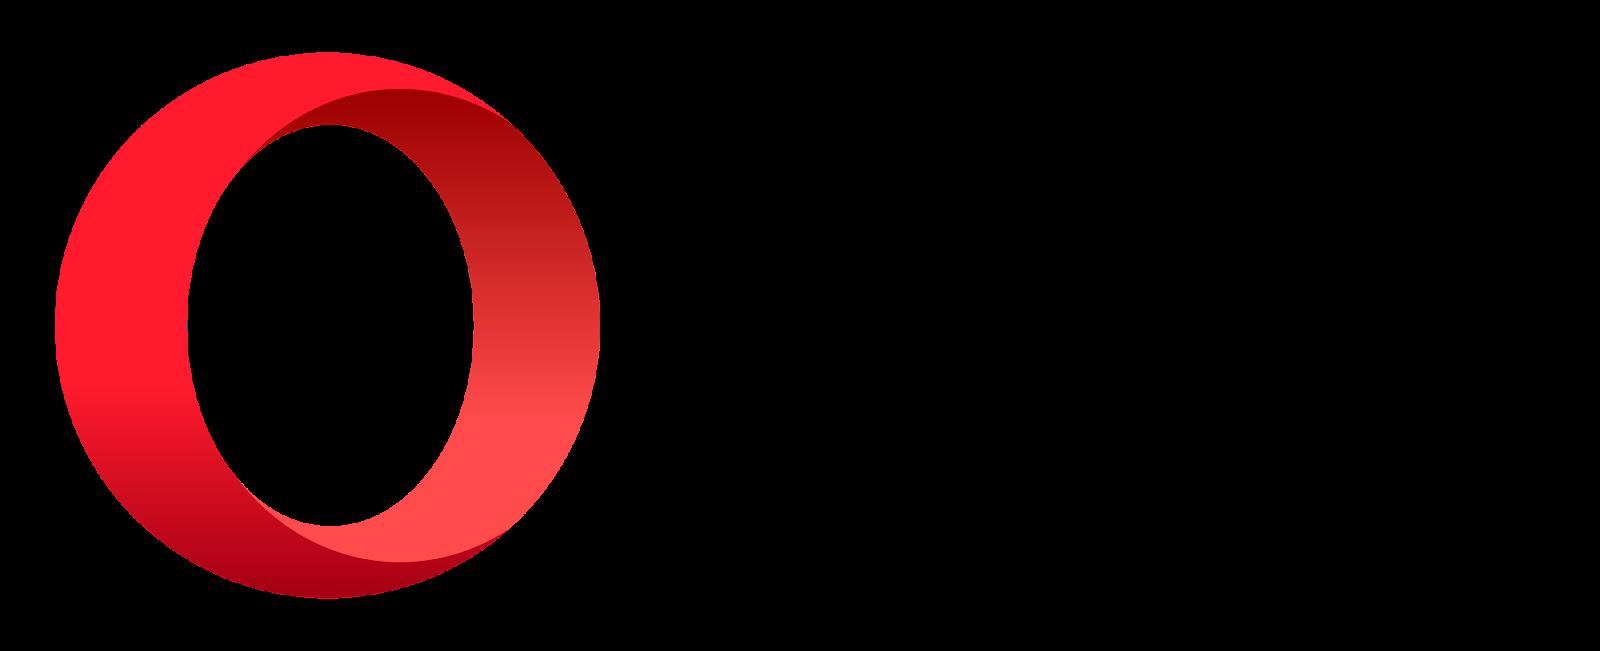 Chrome alternatives for devs - madewithlove